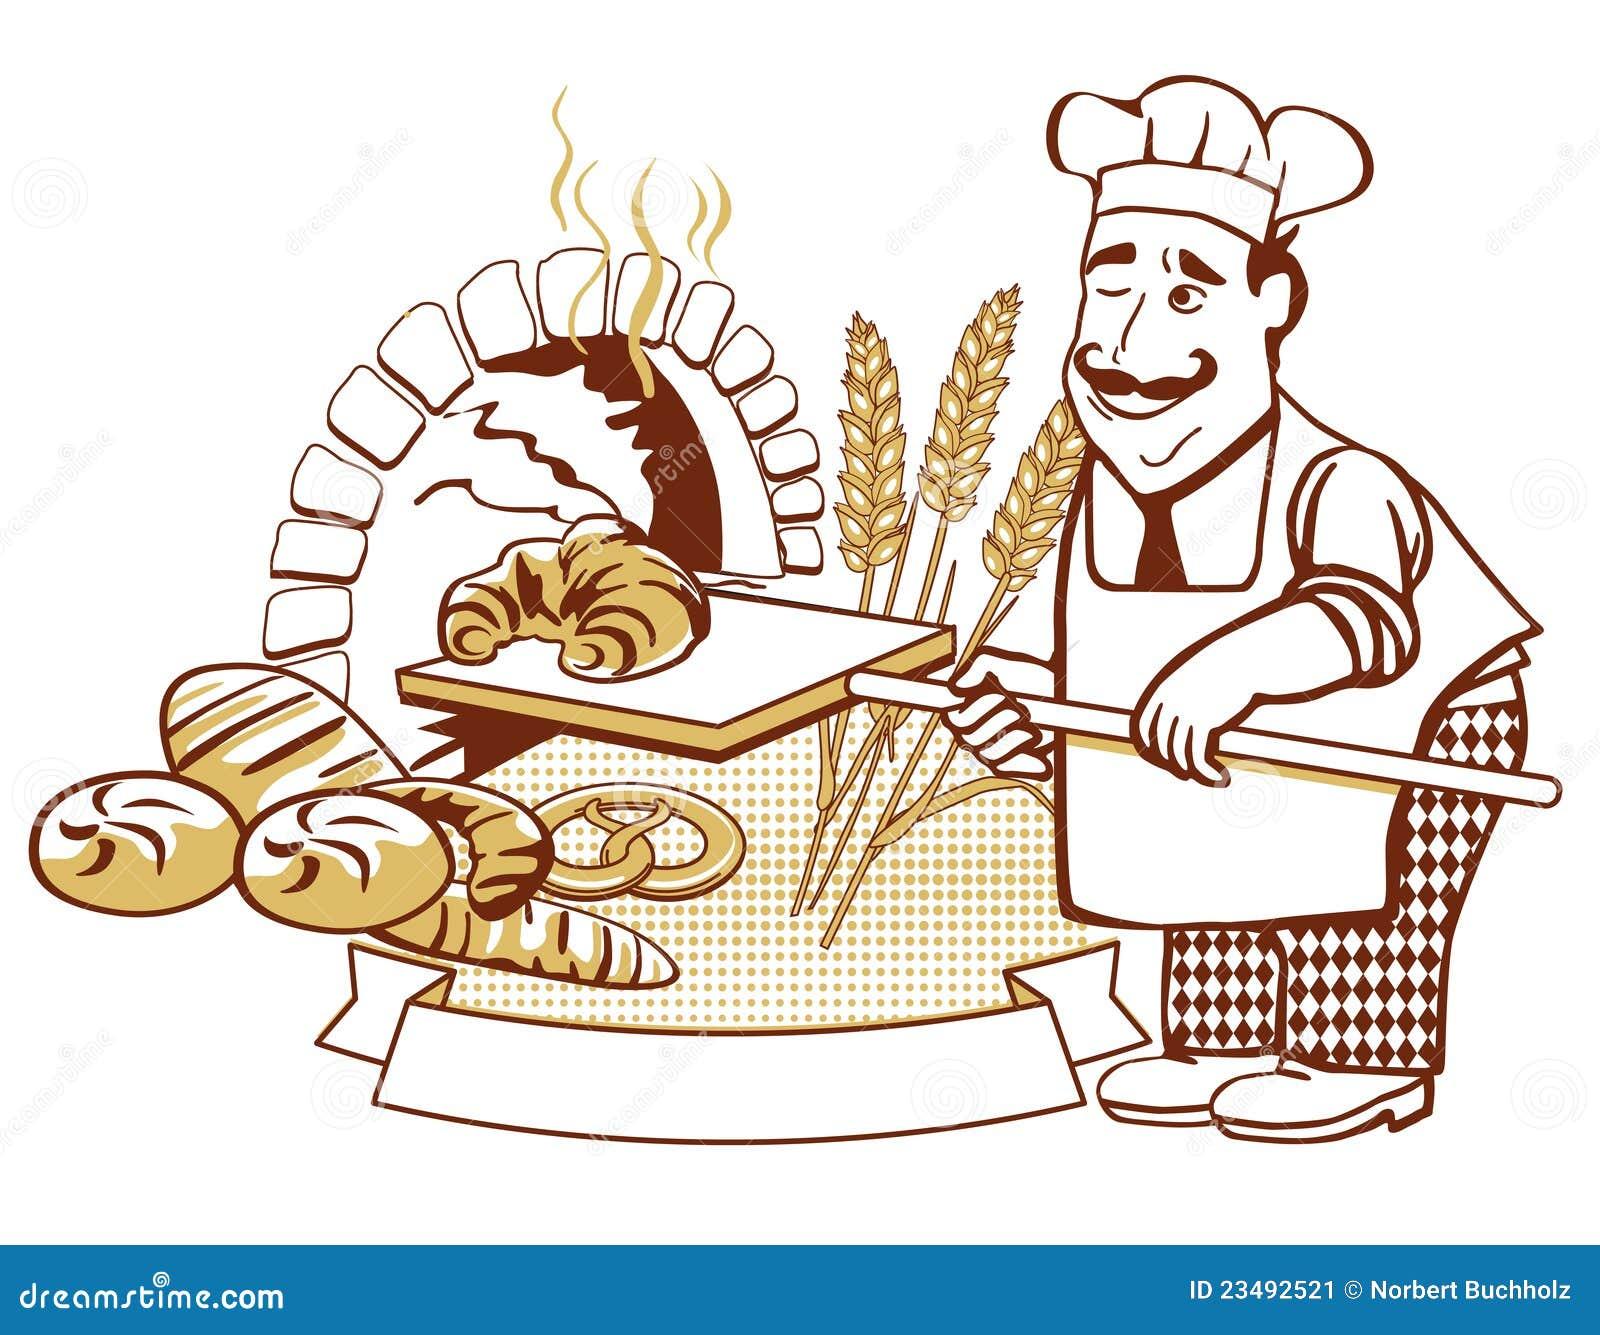 Arbeitsblatt Clipart : Baker at the oven stock vector illustration of boarding